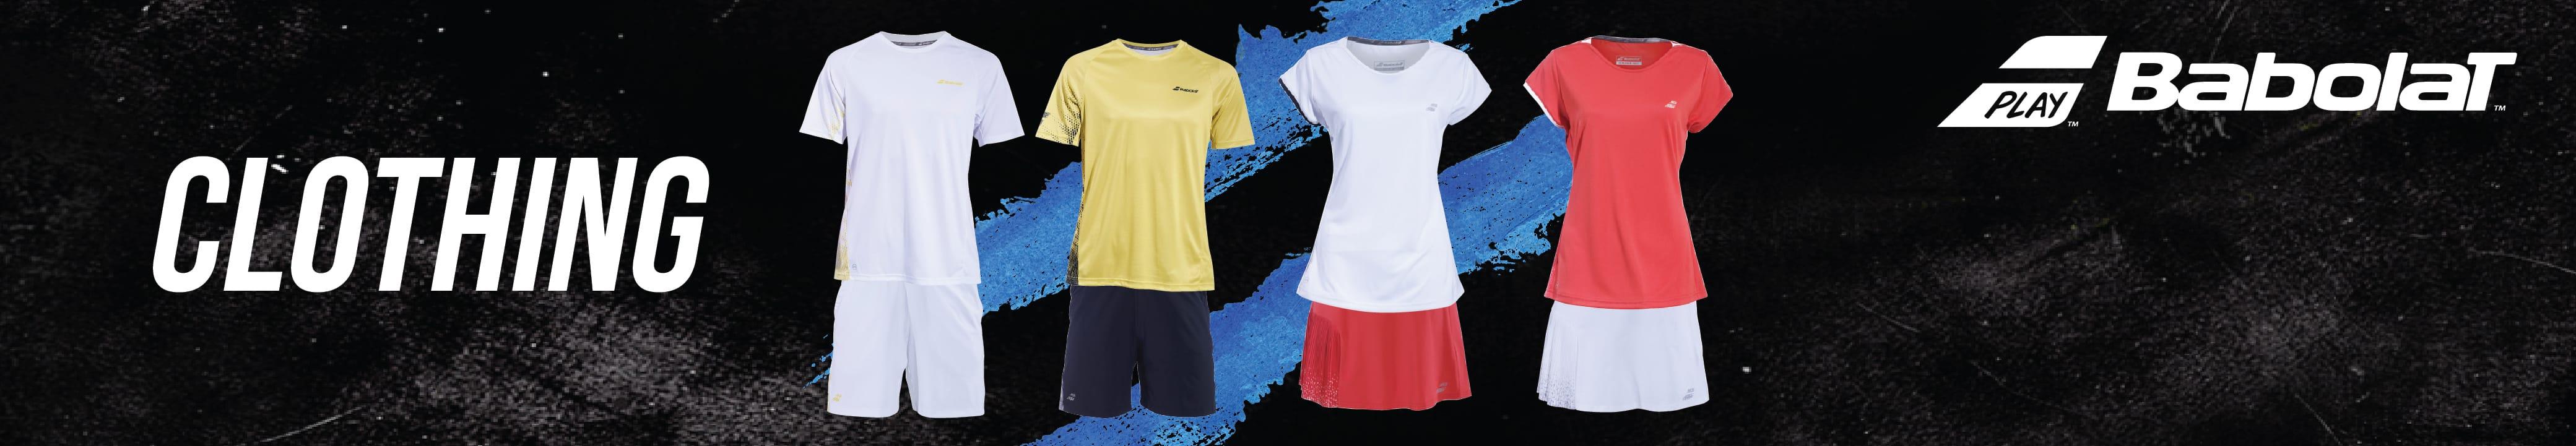 Tenniskleding Babolat